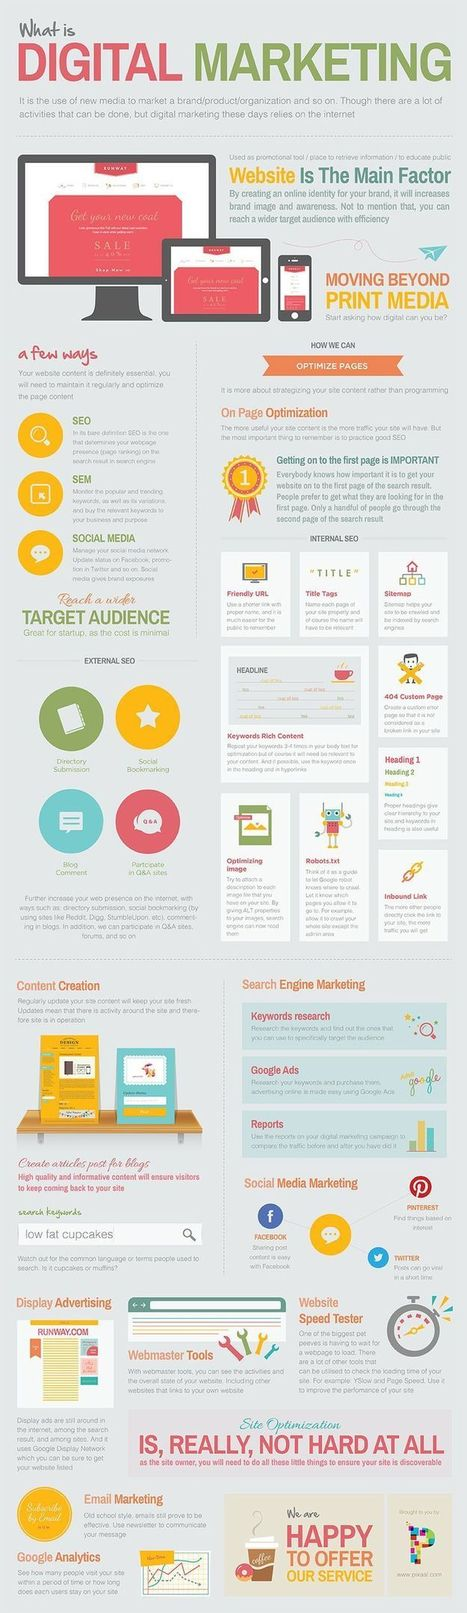 What is Digital Marketing? | Digital Marketing | Scoop.it